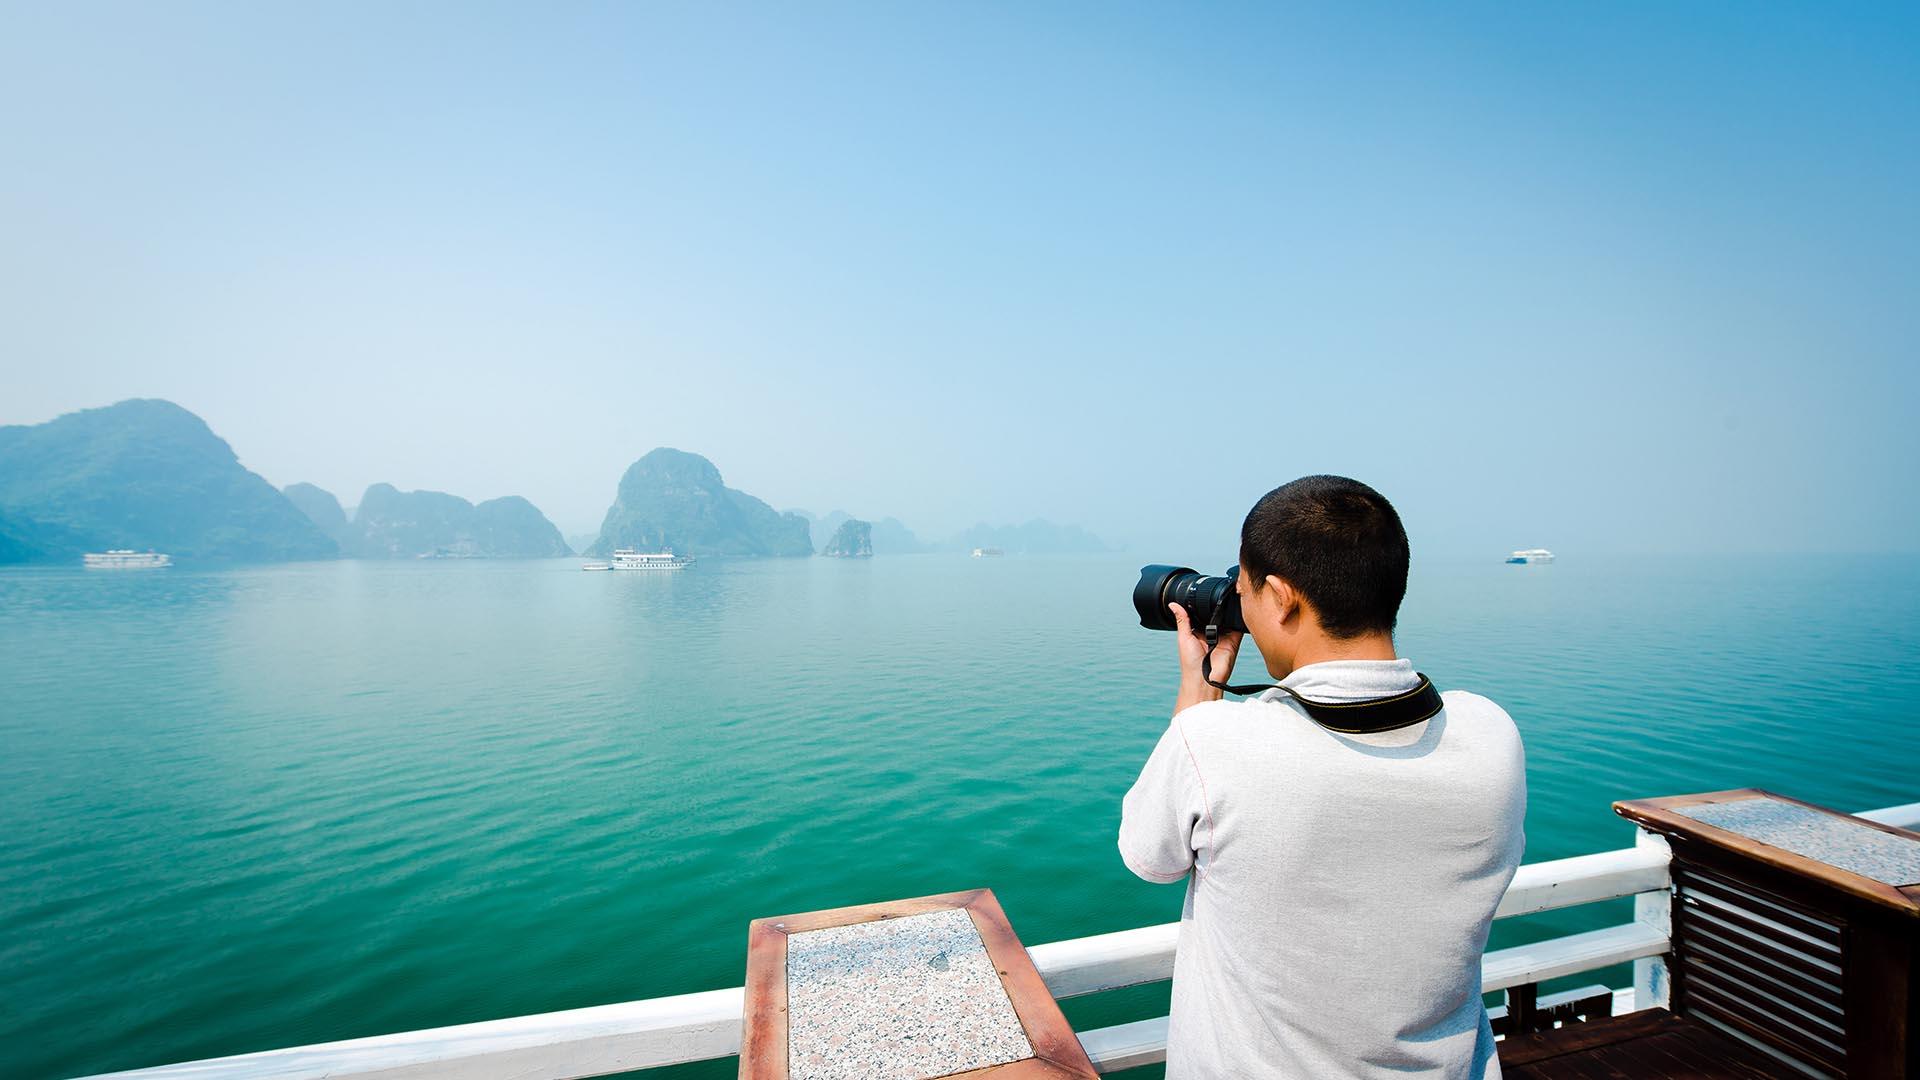 Photographer in Halong Bay | Halong Bay Cruises